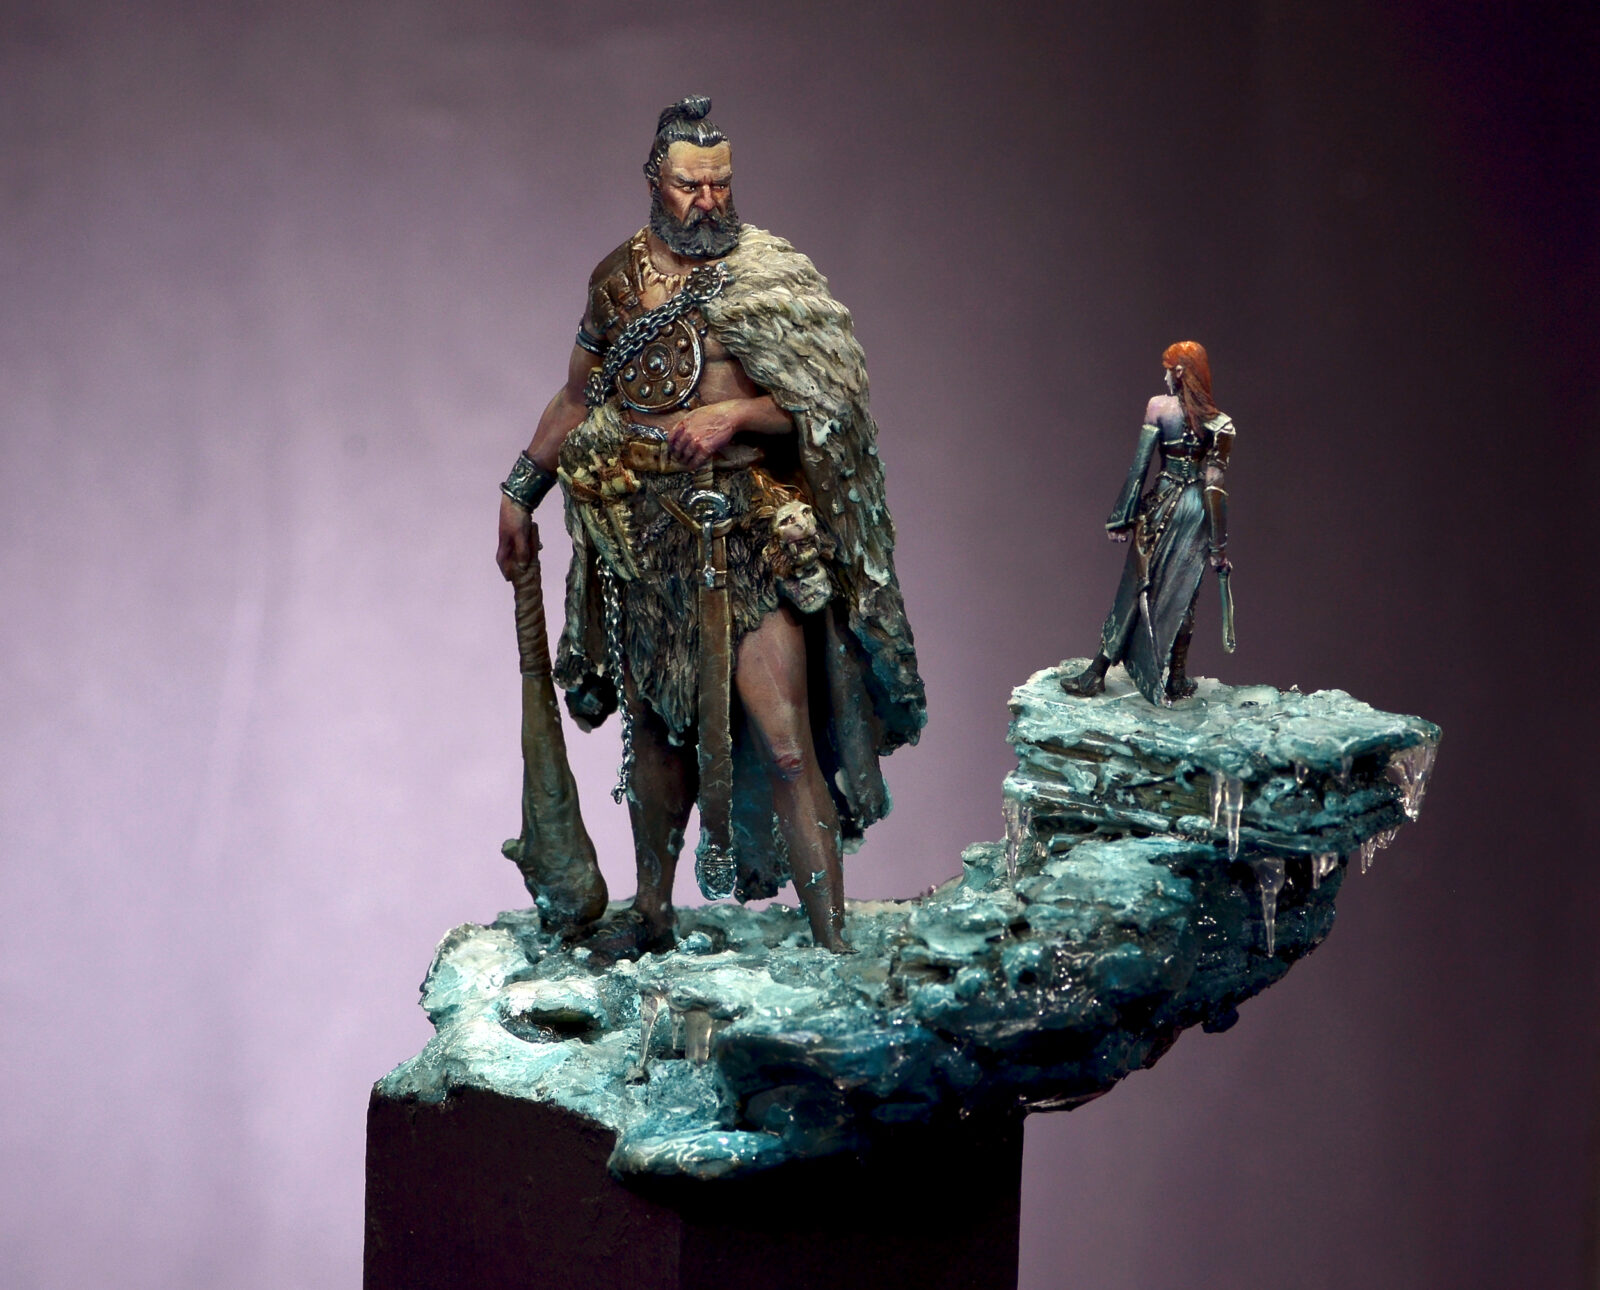 David Goliath02